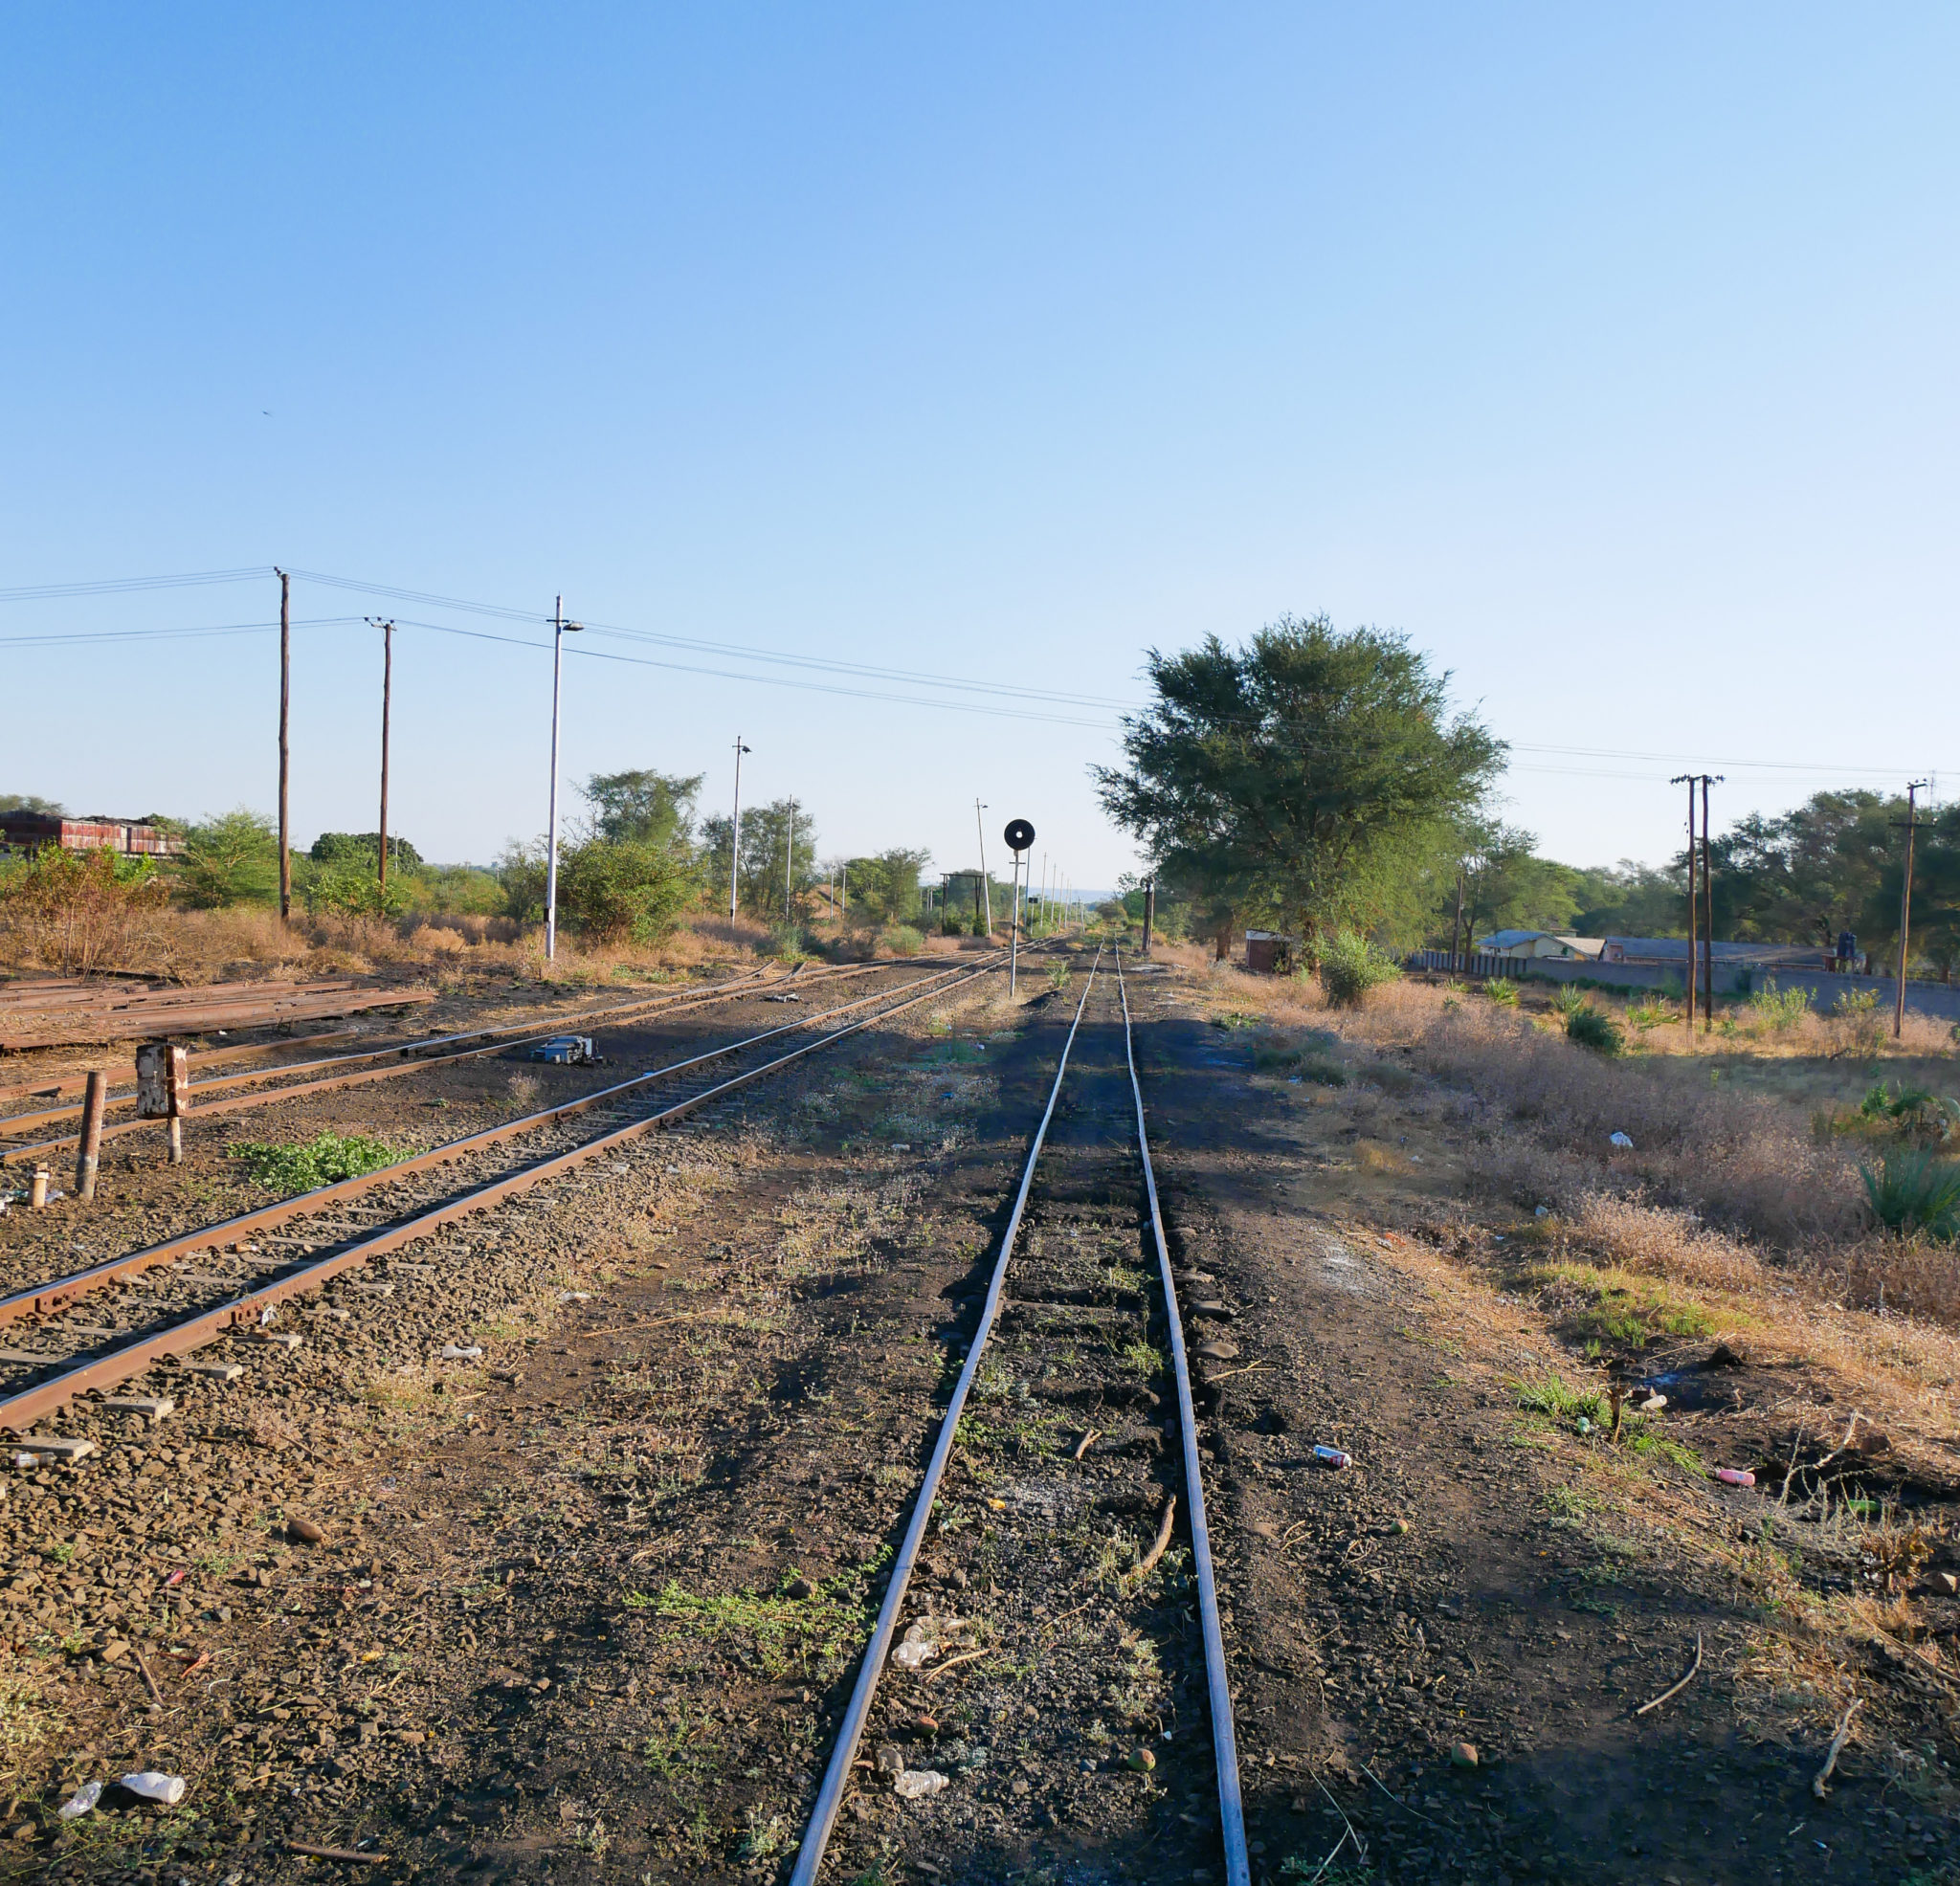 Train tracks along the sidings from the Royal Livingstone Express train